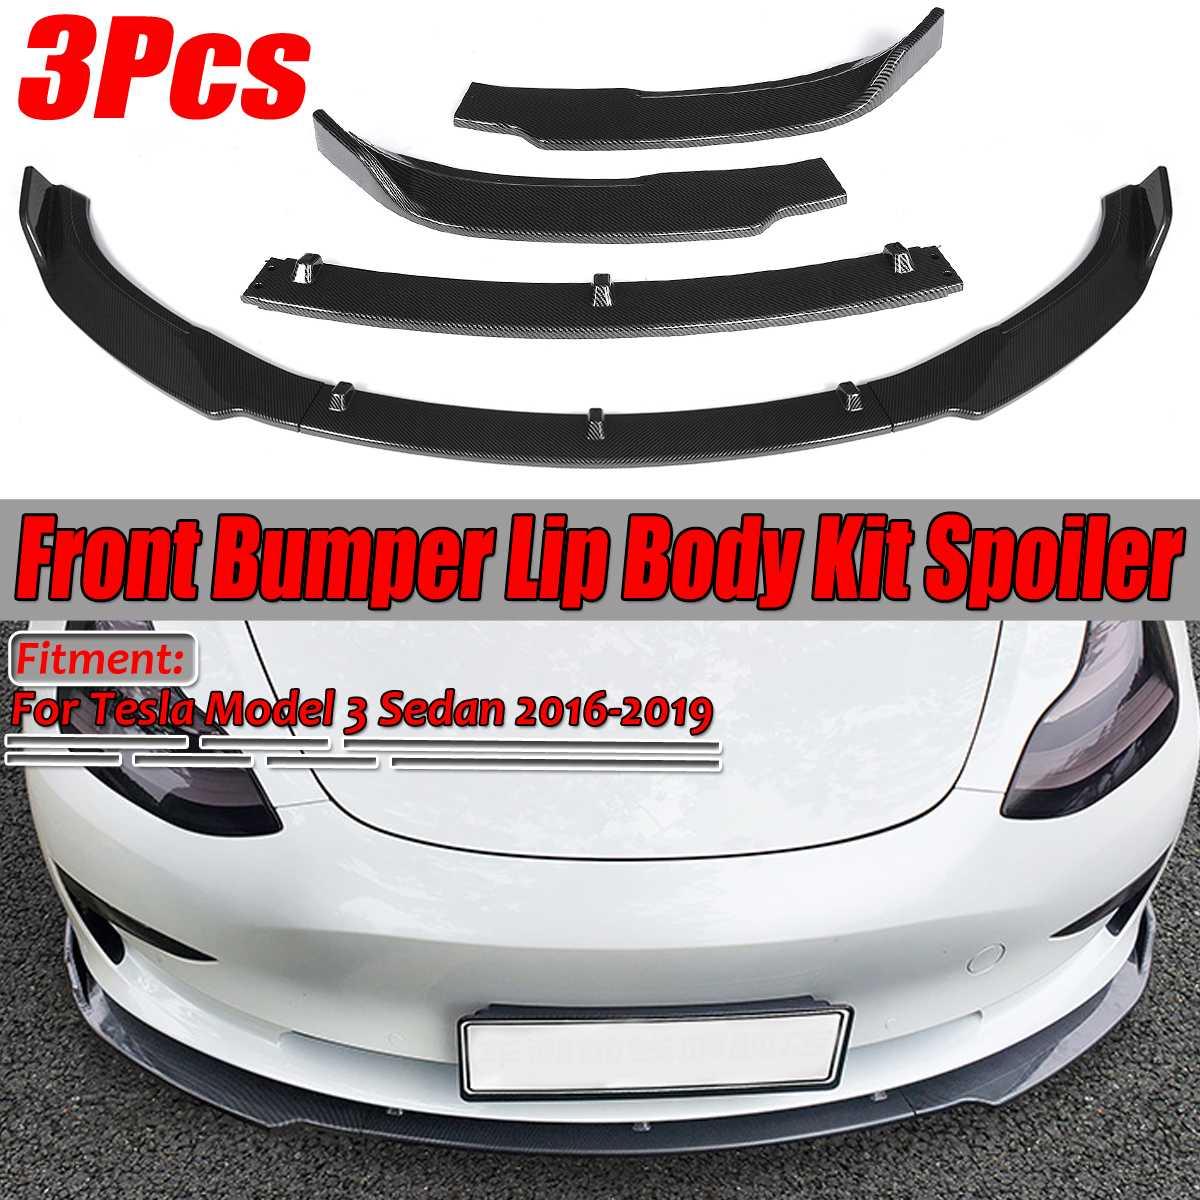 Neue 3Pcs Carbon Fiber Look/Schwarz Auto Front Stoßstange Splitter Lip Body Kit Spoiler Diffusor Schutz Für Tesla modell 3 Limousine 2016-2019